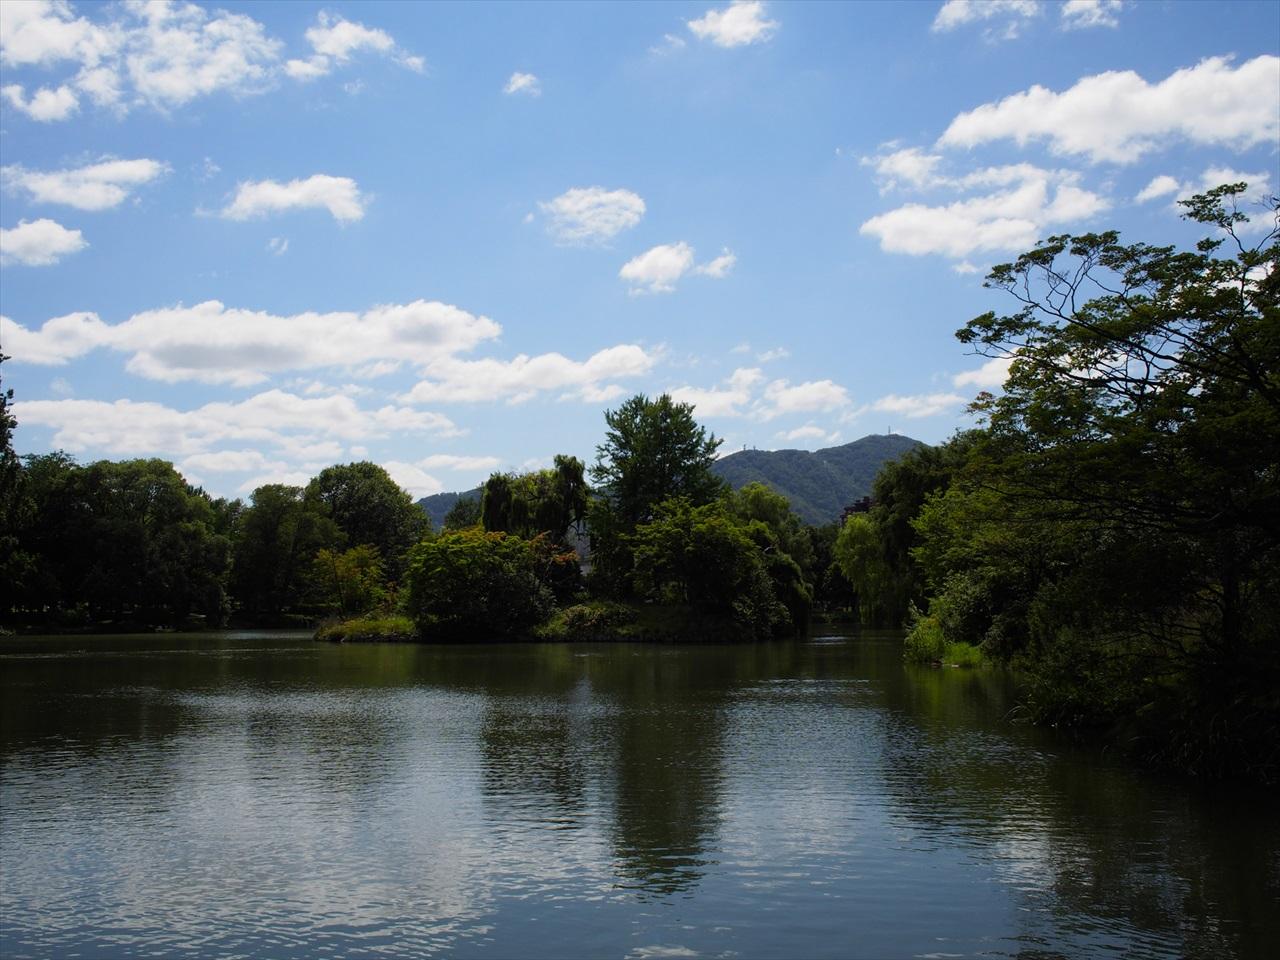 菖蒲池の景色1